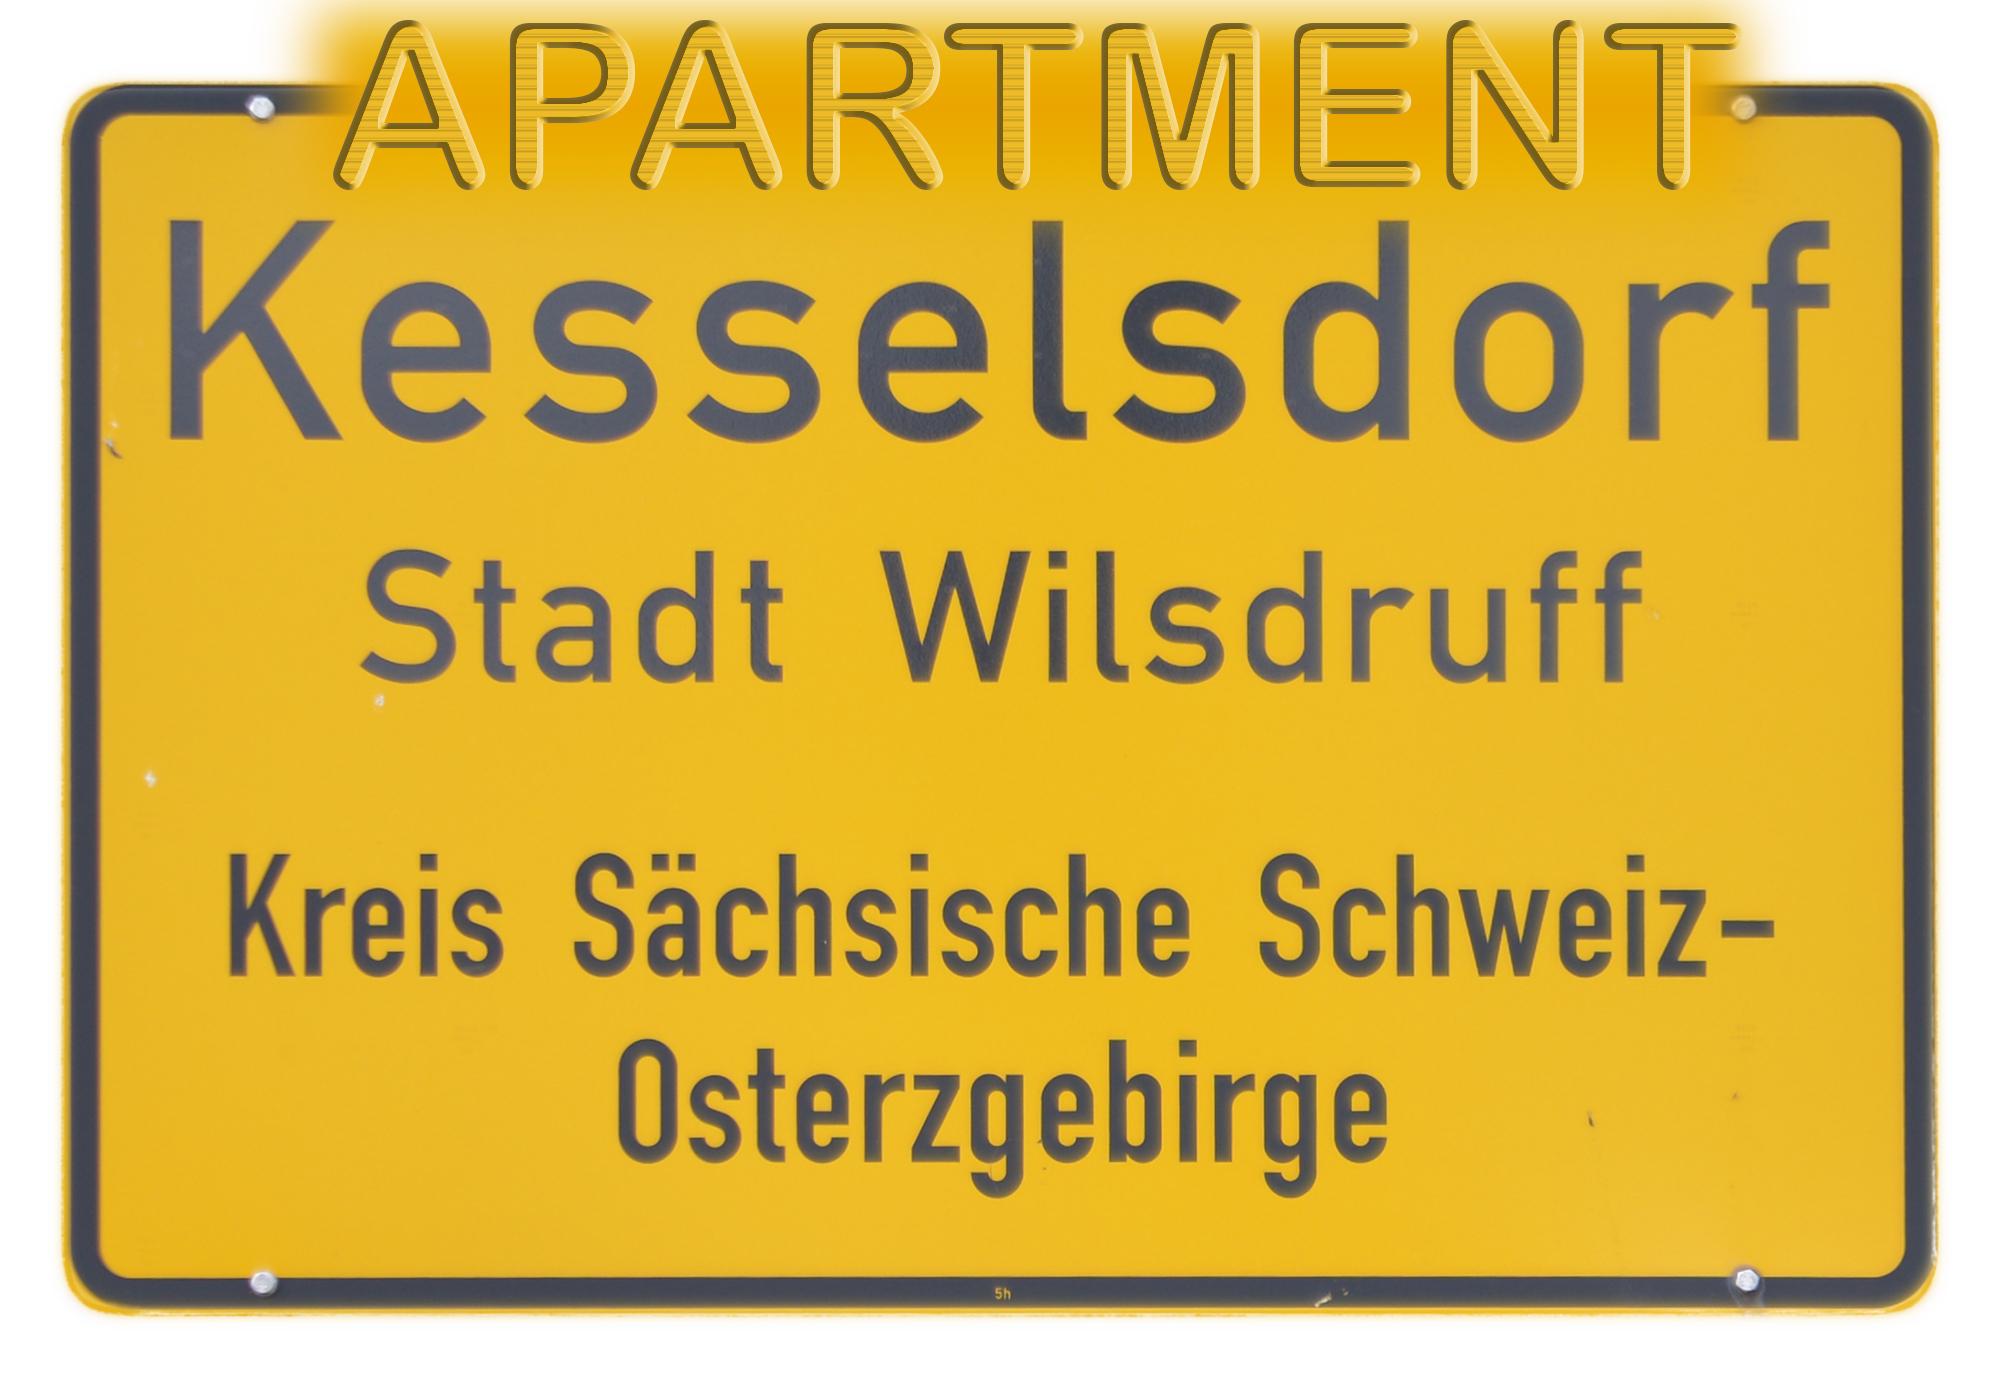 Apartment Dresden Kesselsdorf